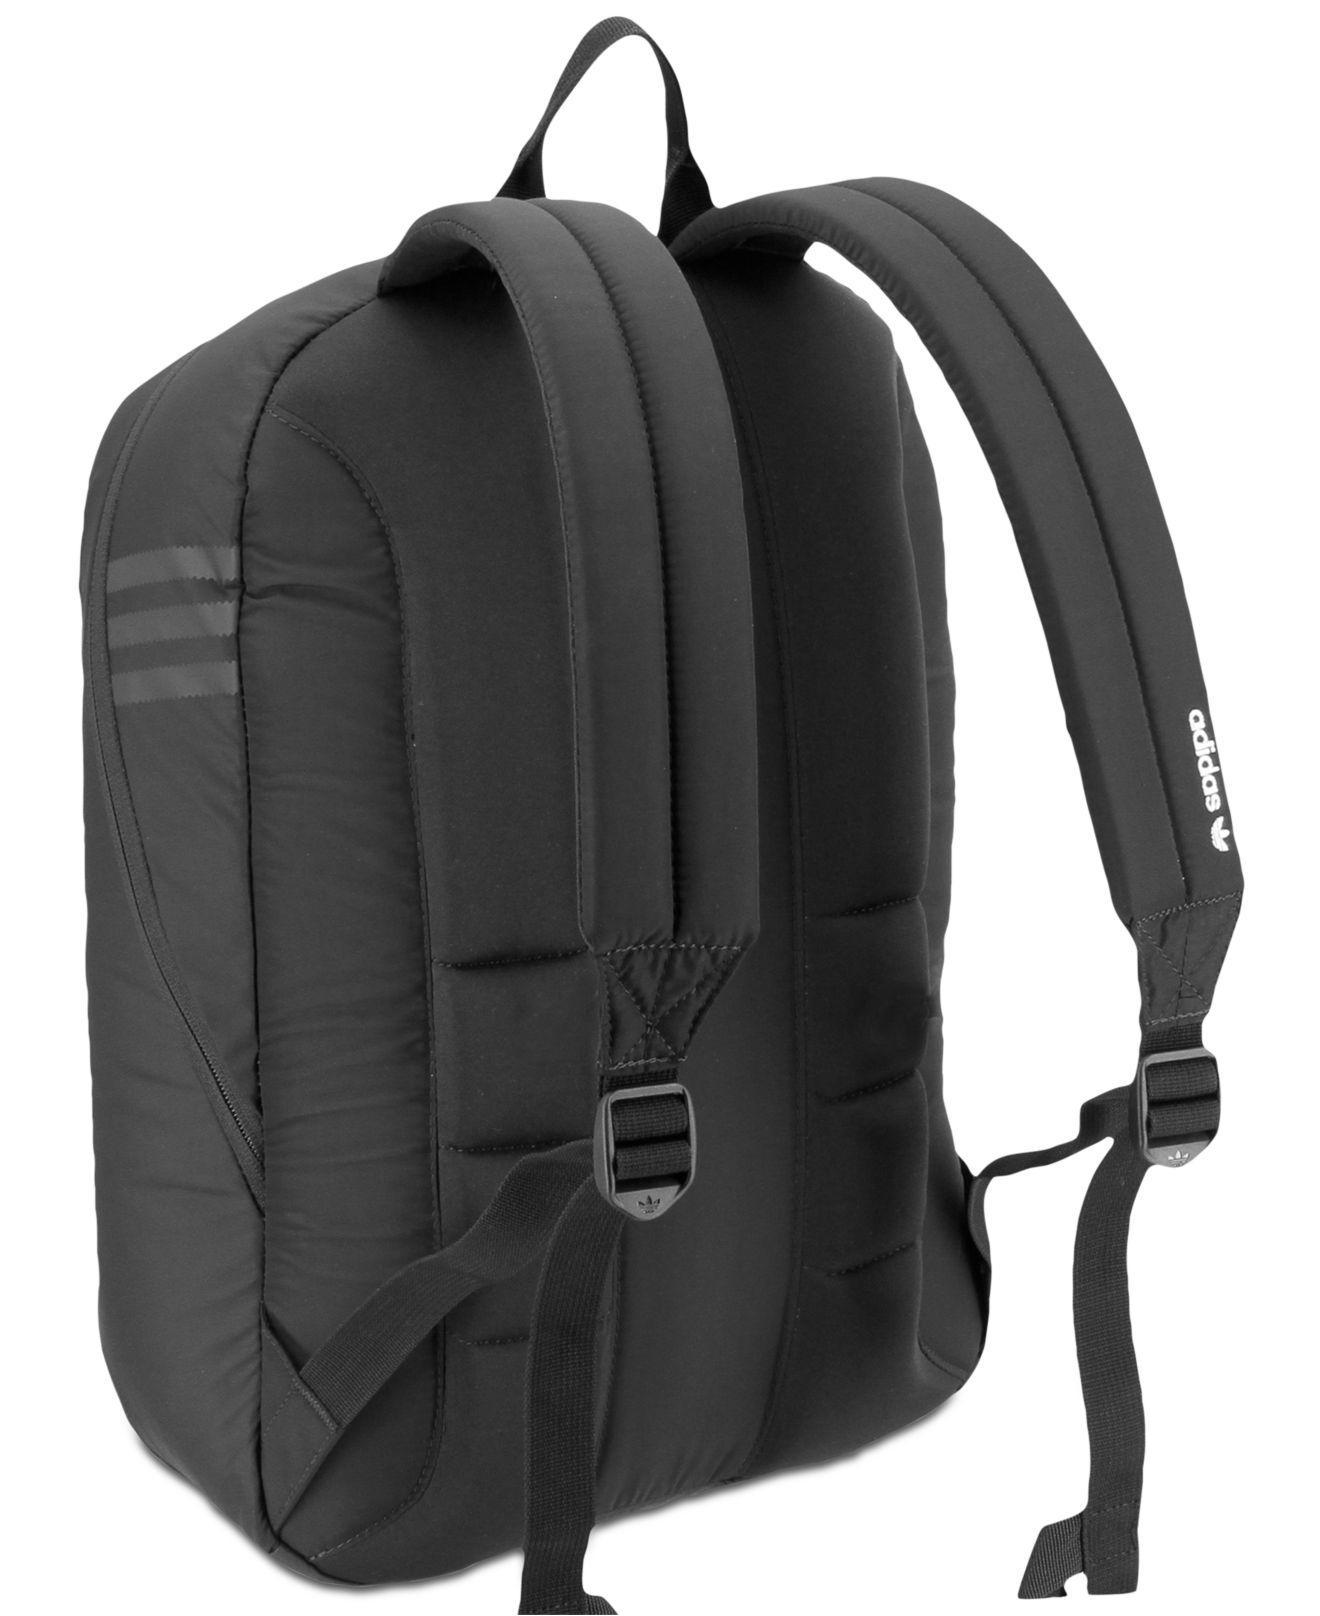 14e9156667f5 Lyst - adidas Originals National Plus Backpack in Black for Men